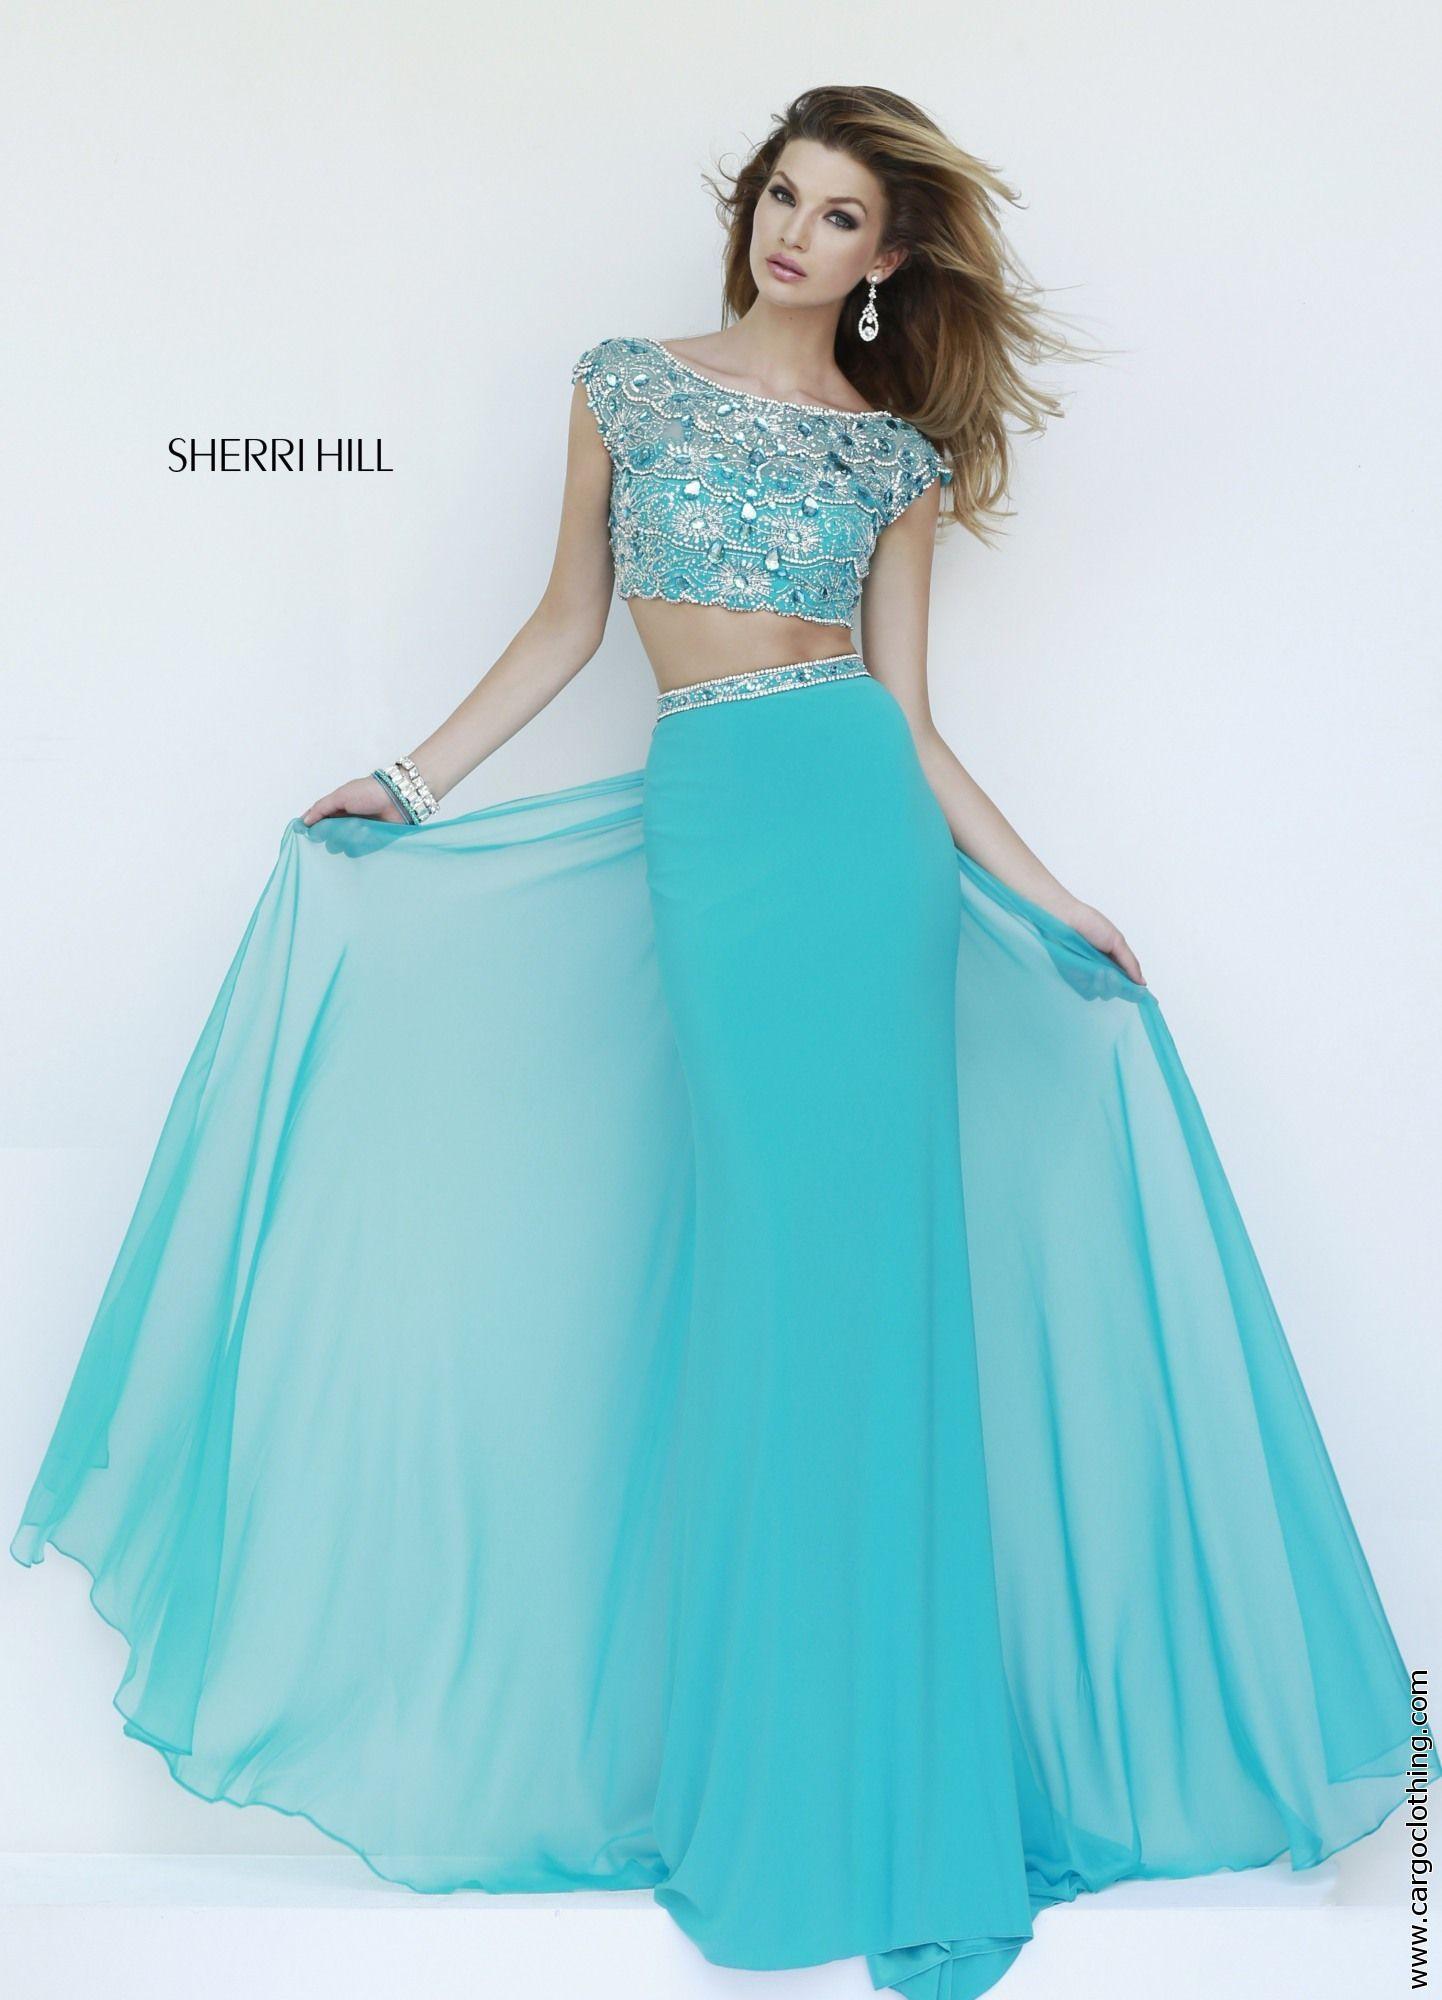 Sherri Hill 11197 Couture Gow In Stock, SHERRI HILL DRESSES, Prom ...